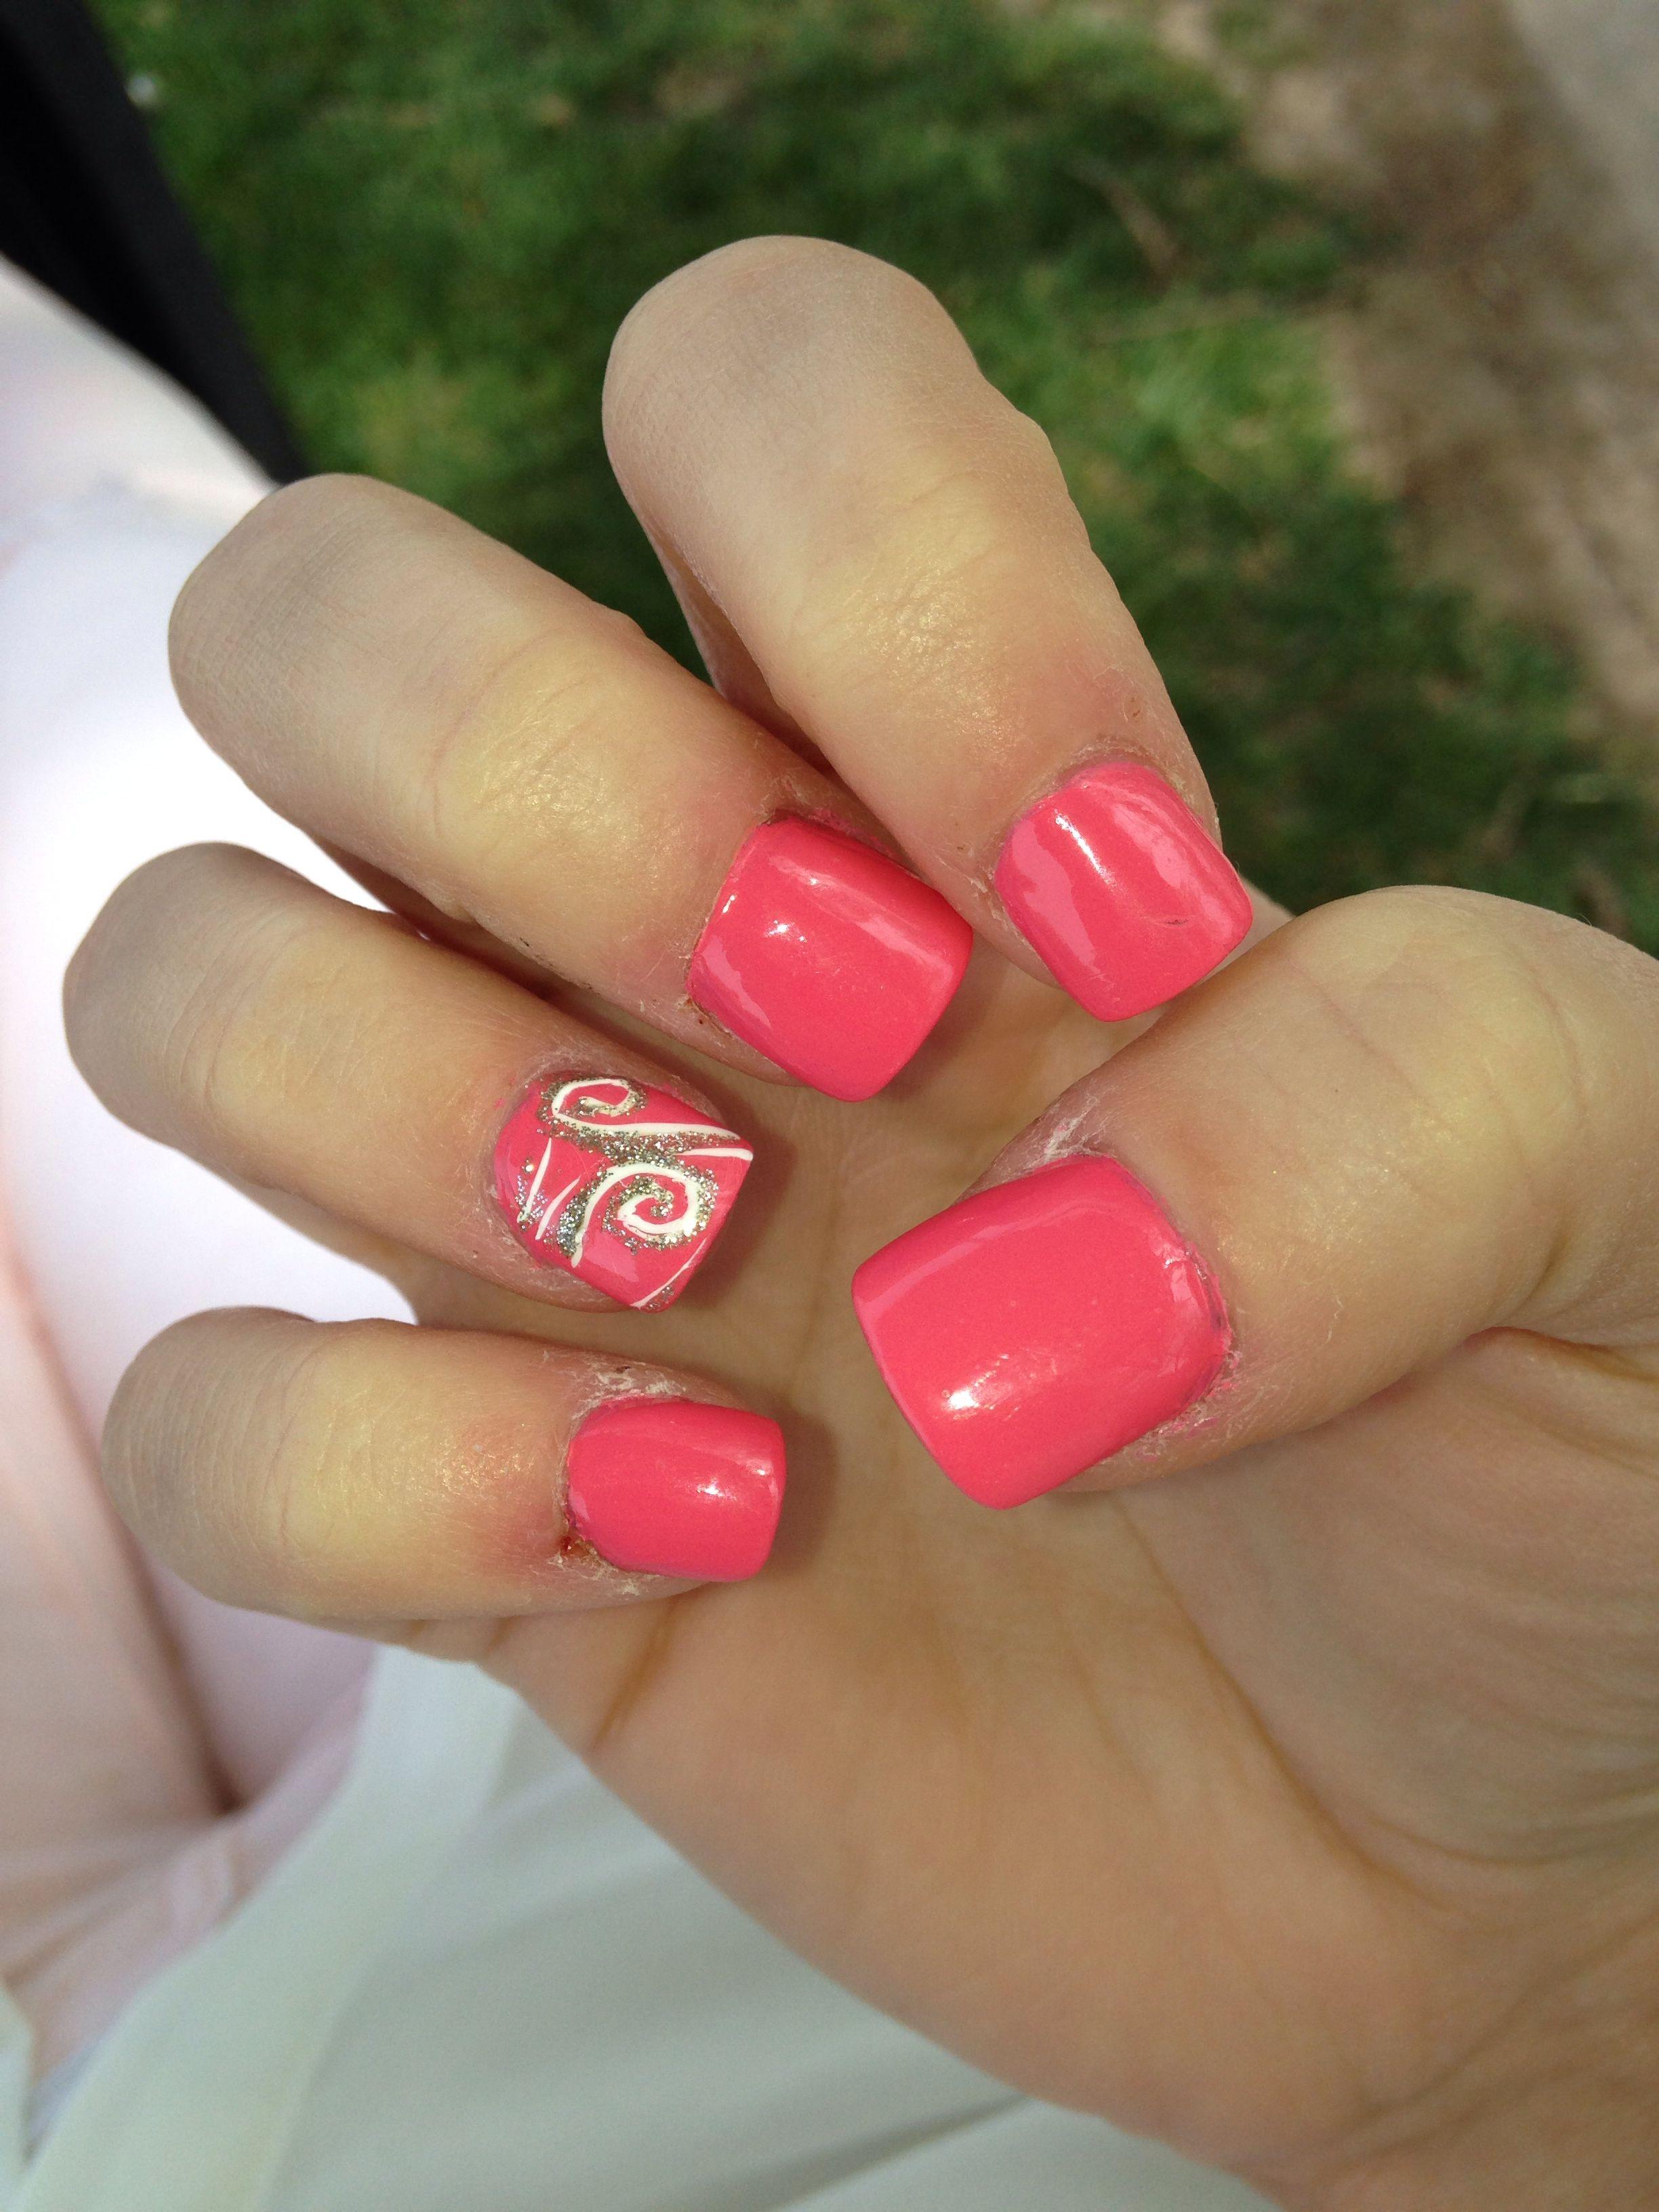 Pink nails! I love them!! Don't mind my bad cuticles. #pink #nails #glitter